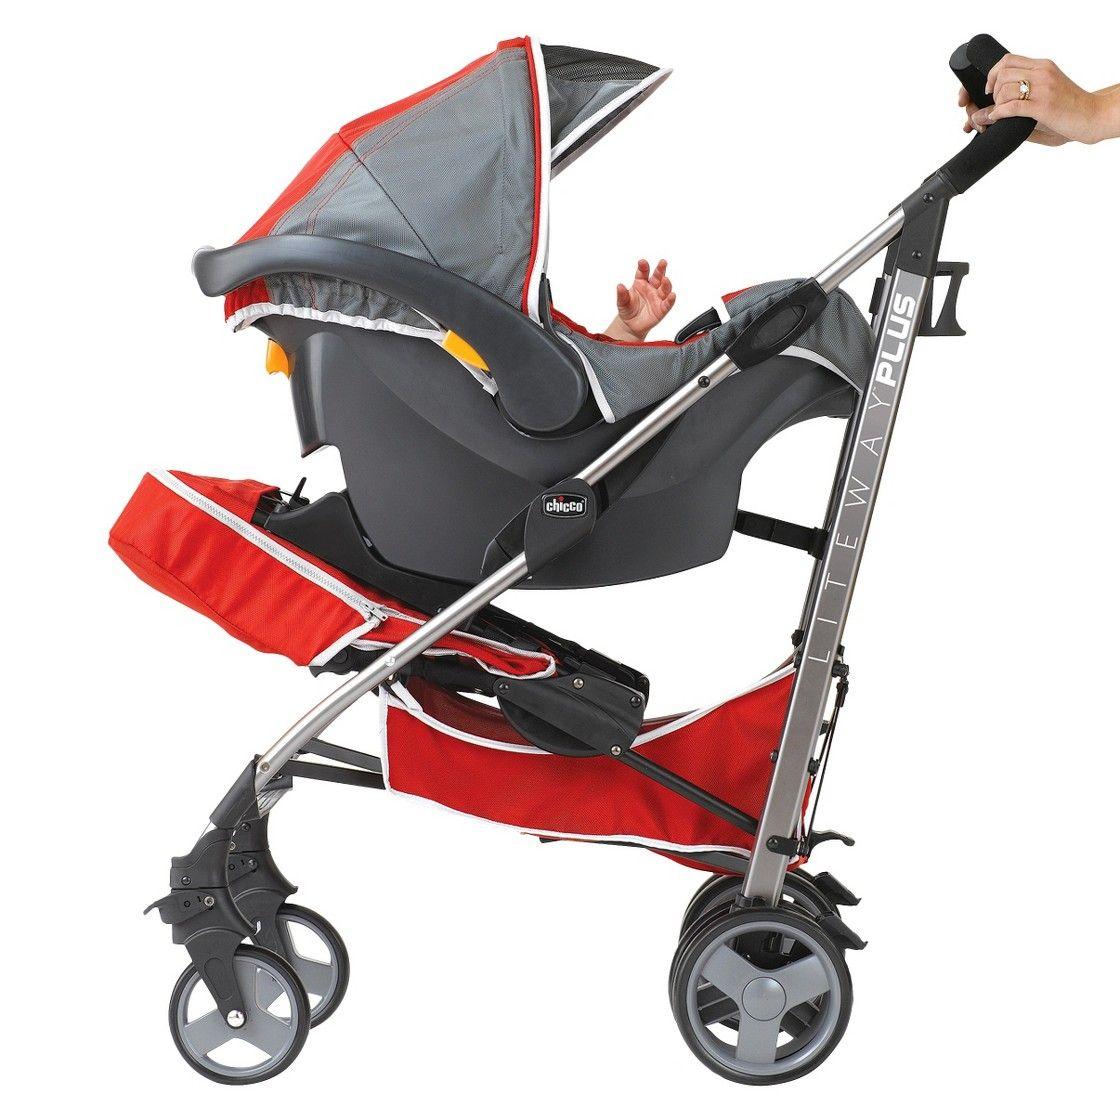 Chicco liteway plus snapdragon umbrella stroller